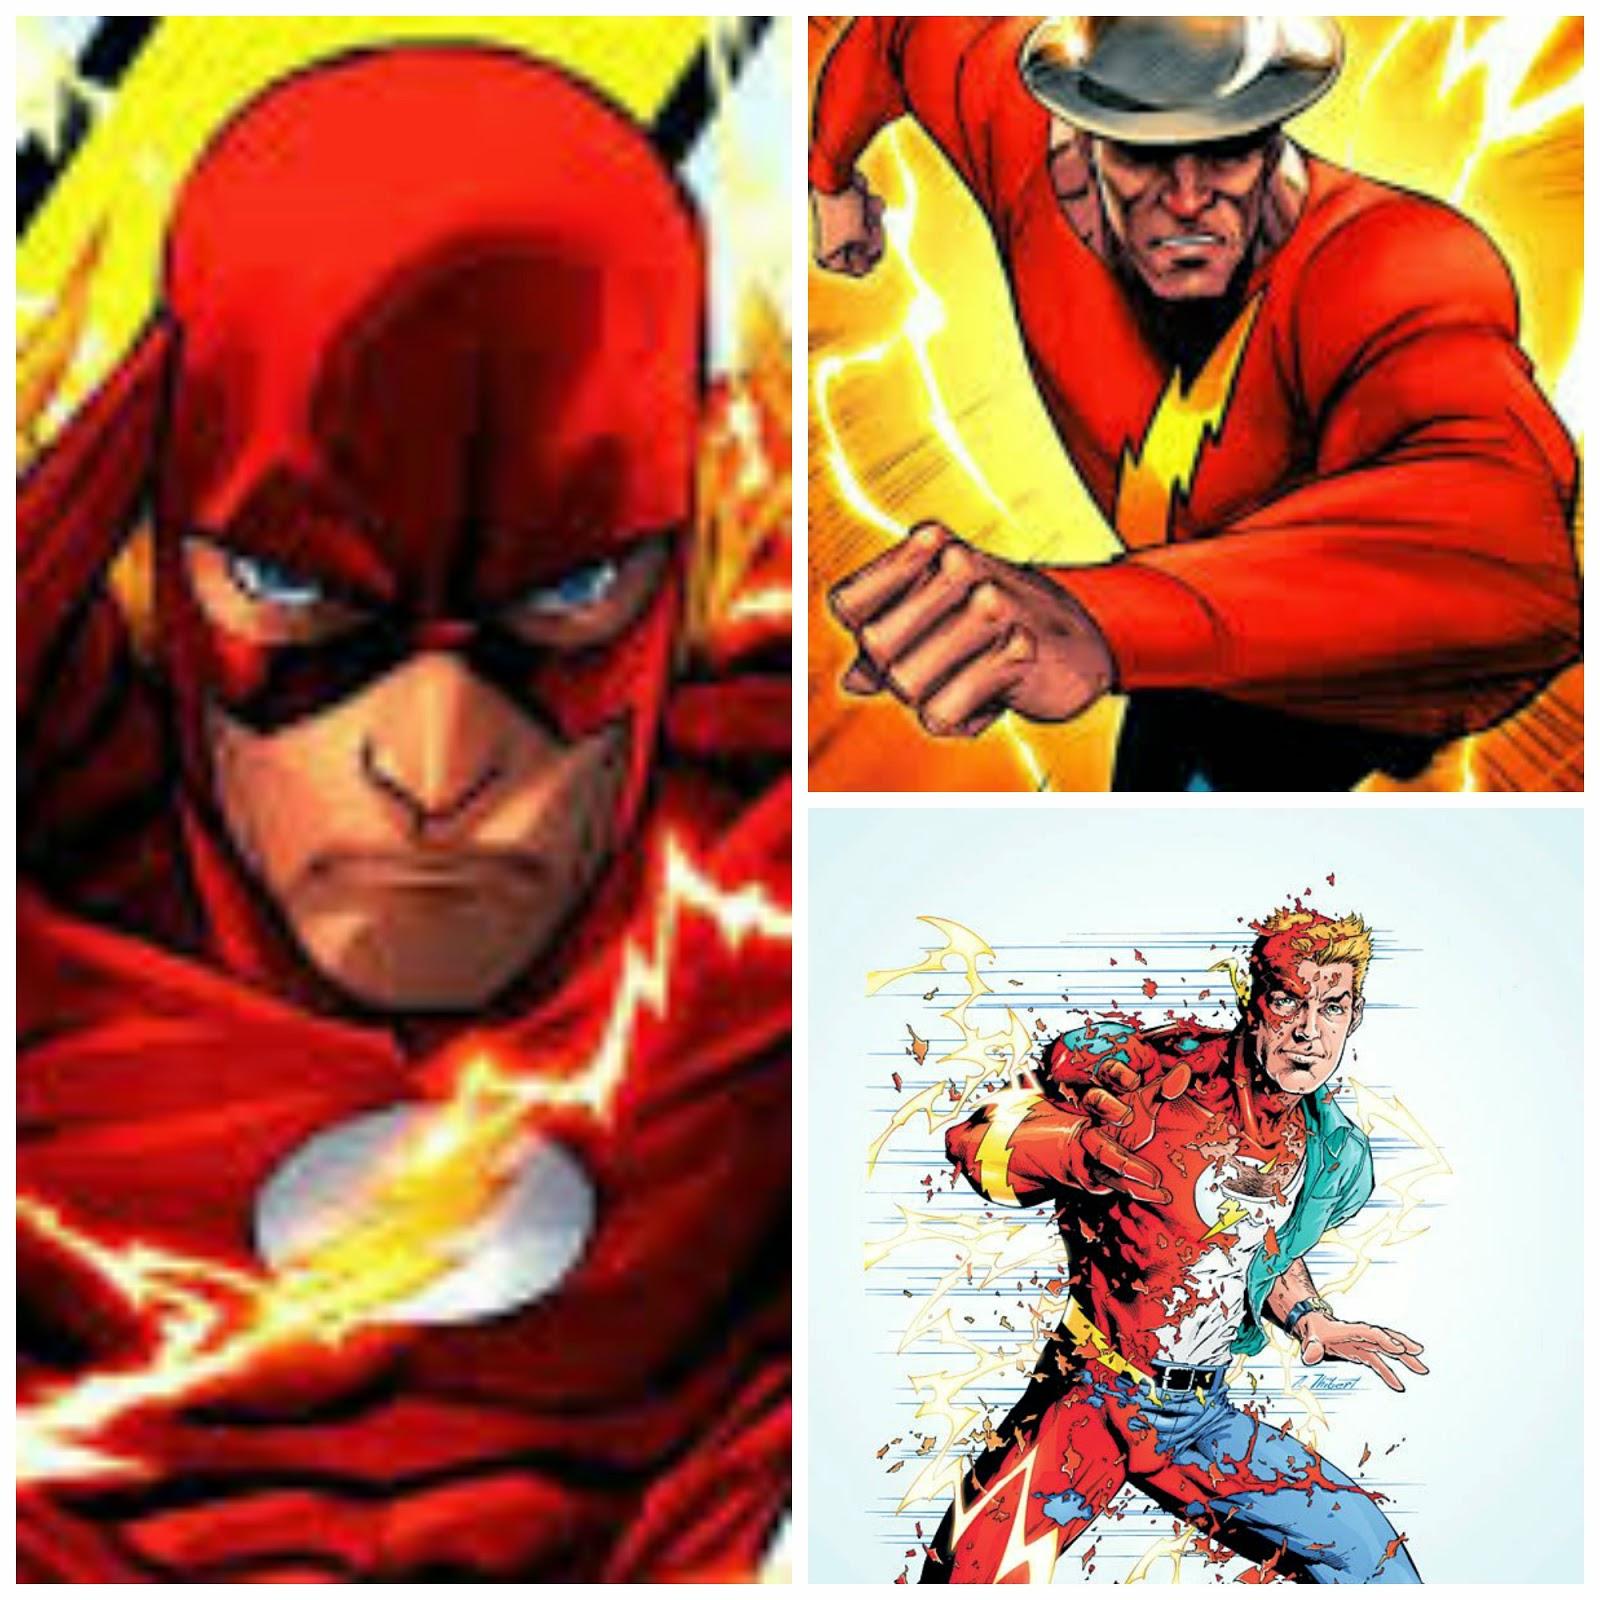 Jay Garrick, Barry Allen y Wally West. The Flash